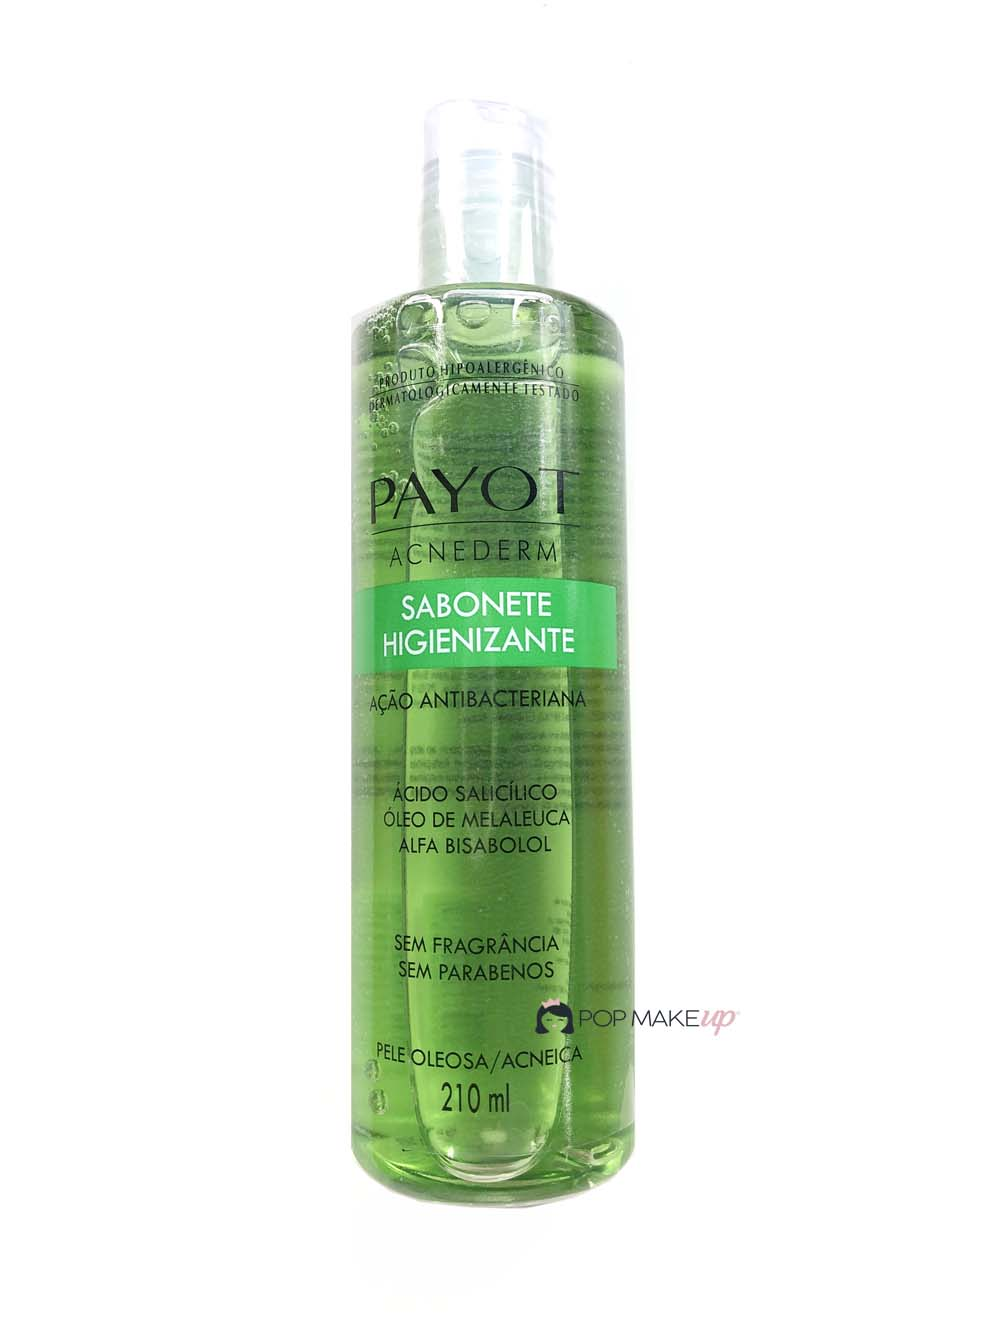 Acnederm Sabonete Higienizante | Payot